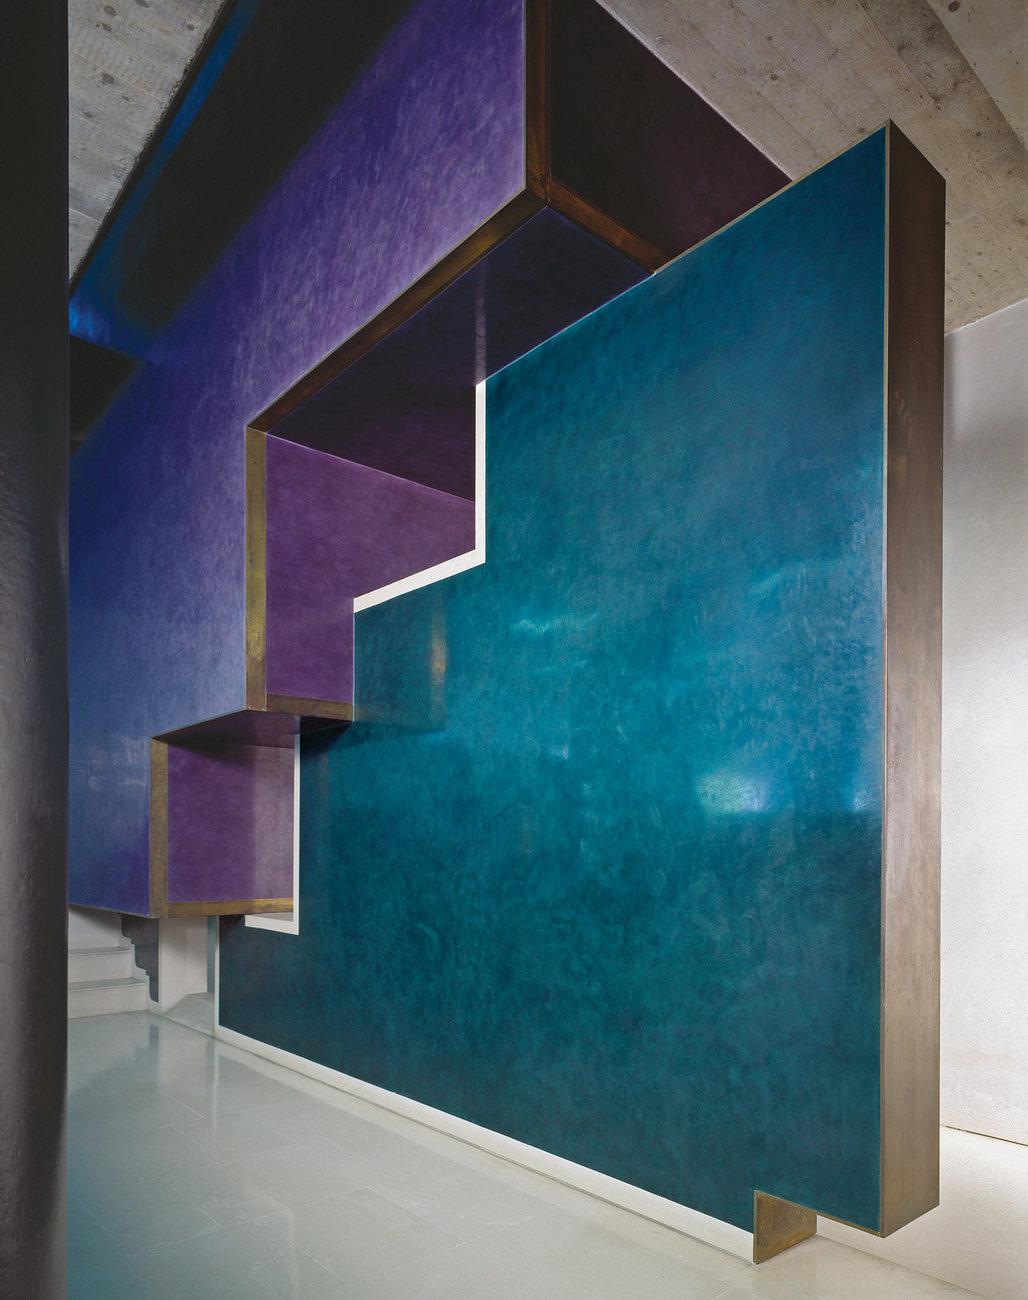 Marmorino walls at the Banco Popolare in Verona showcase the architect's love of interlocking geometrical shapes. Klaus Frahm/Artur Images